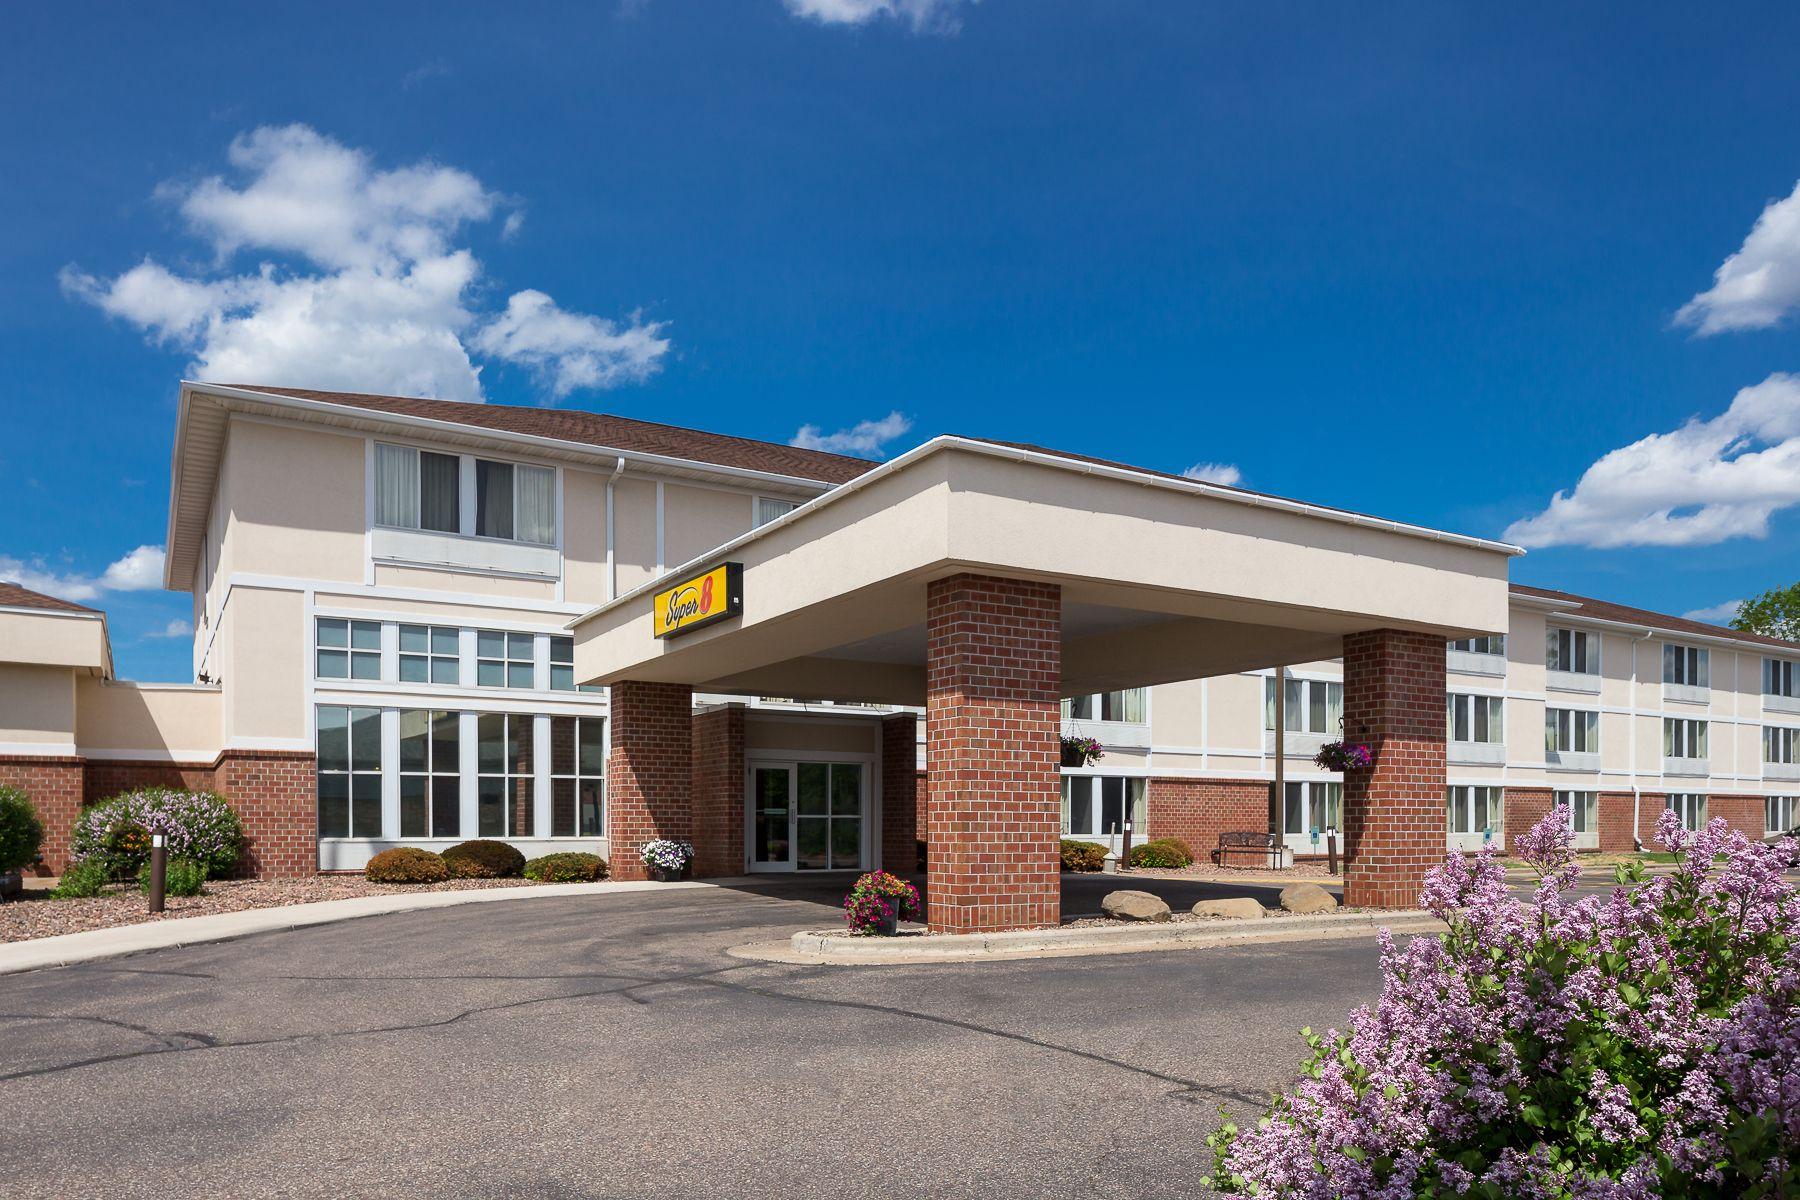 Menomonie Super 8 Located Off Interstate 94 The Super 8 Of Menomonie Wisconsin Is Near Wakanda Waterpark And Is Minutes From M Menomonie Hotel House Styles